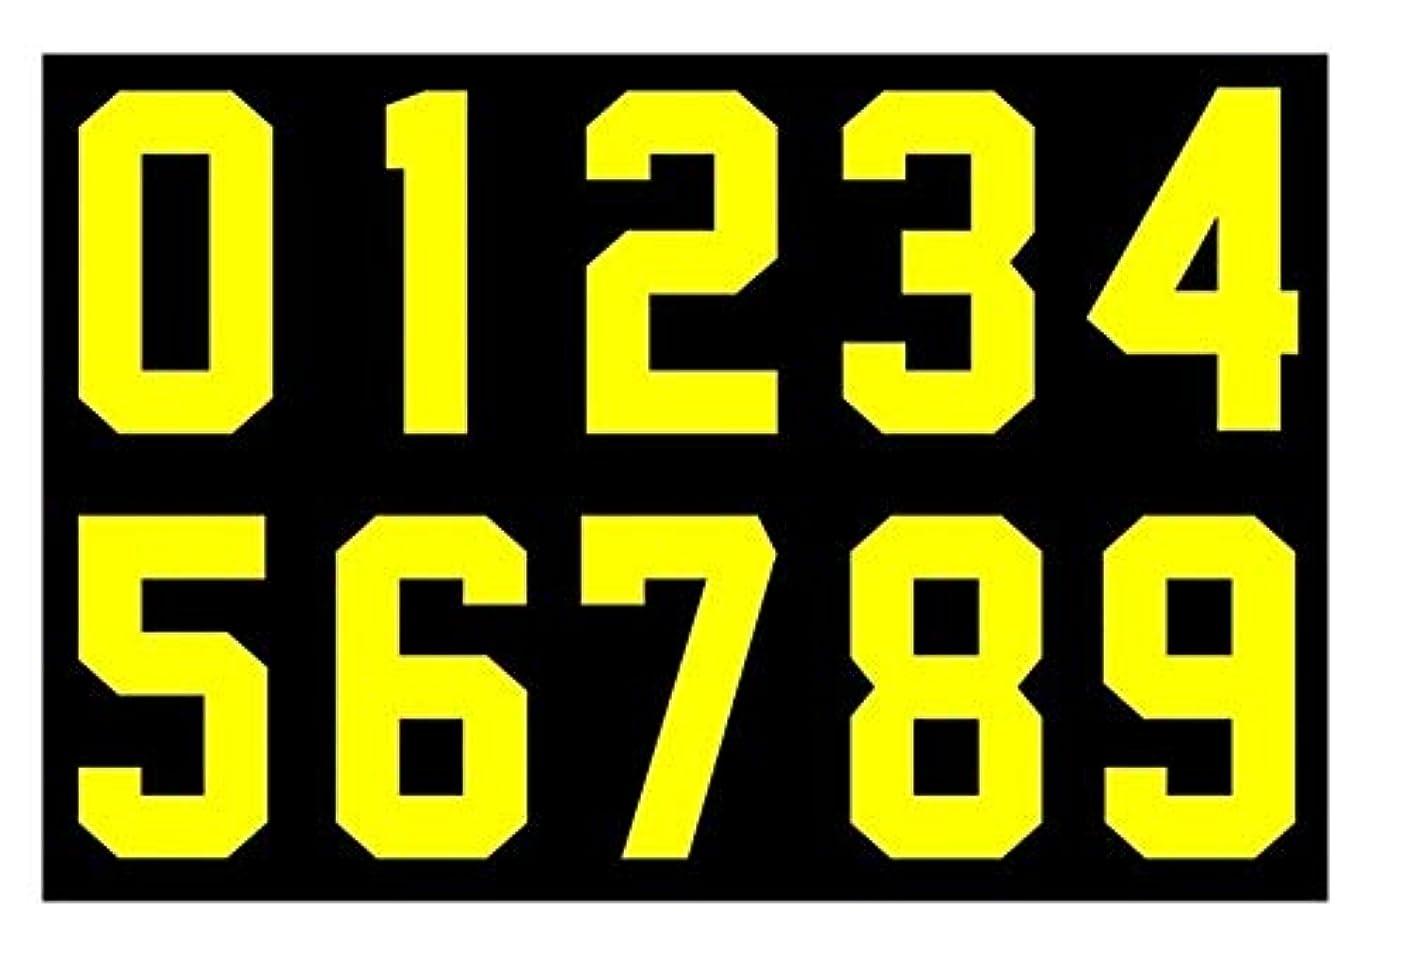 Numbers Kit(0-9),3 Inch Tall for Sports T-Shirt Jersey Football Baseball,Iron On, Heat Transfer, Team,t-Shirt(0-9) (Yellow)